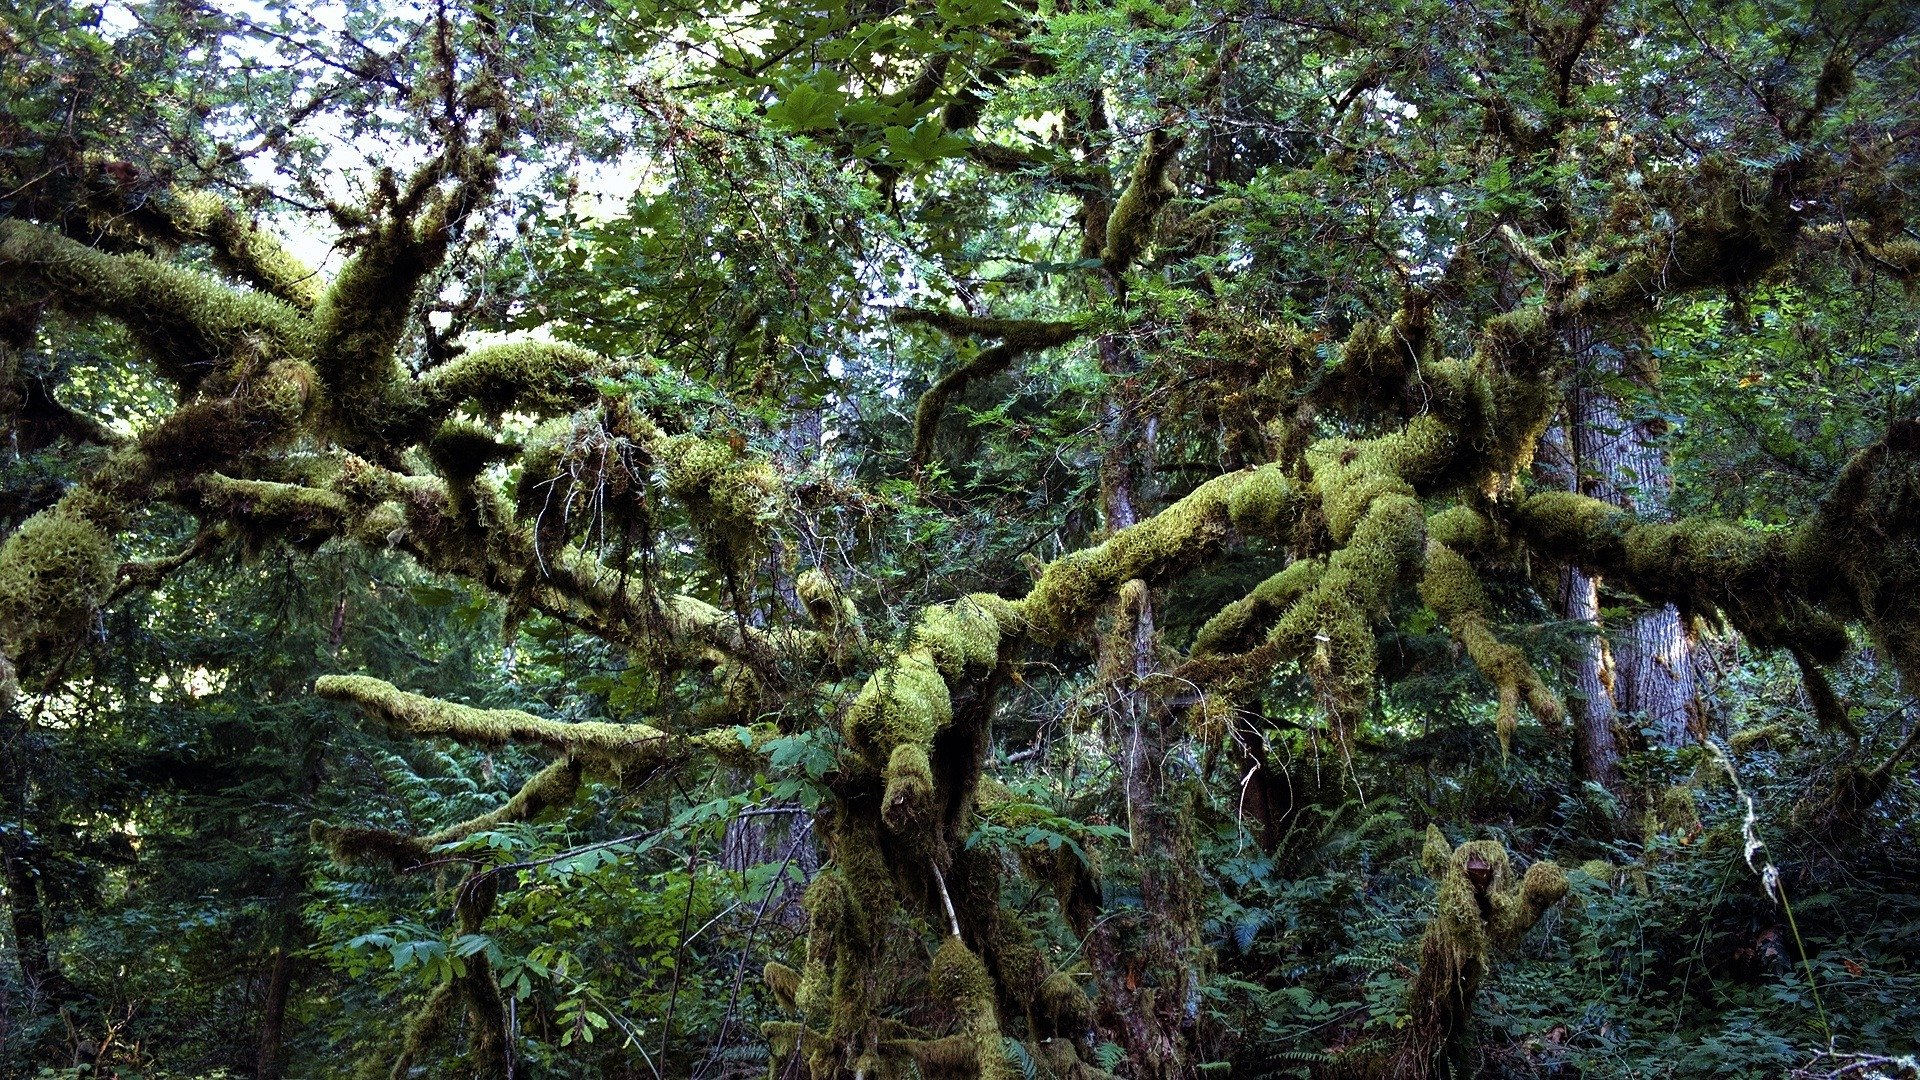 Hd wallpaper jungle - Earth Jungle Forest Wood Wallpaper